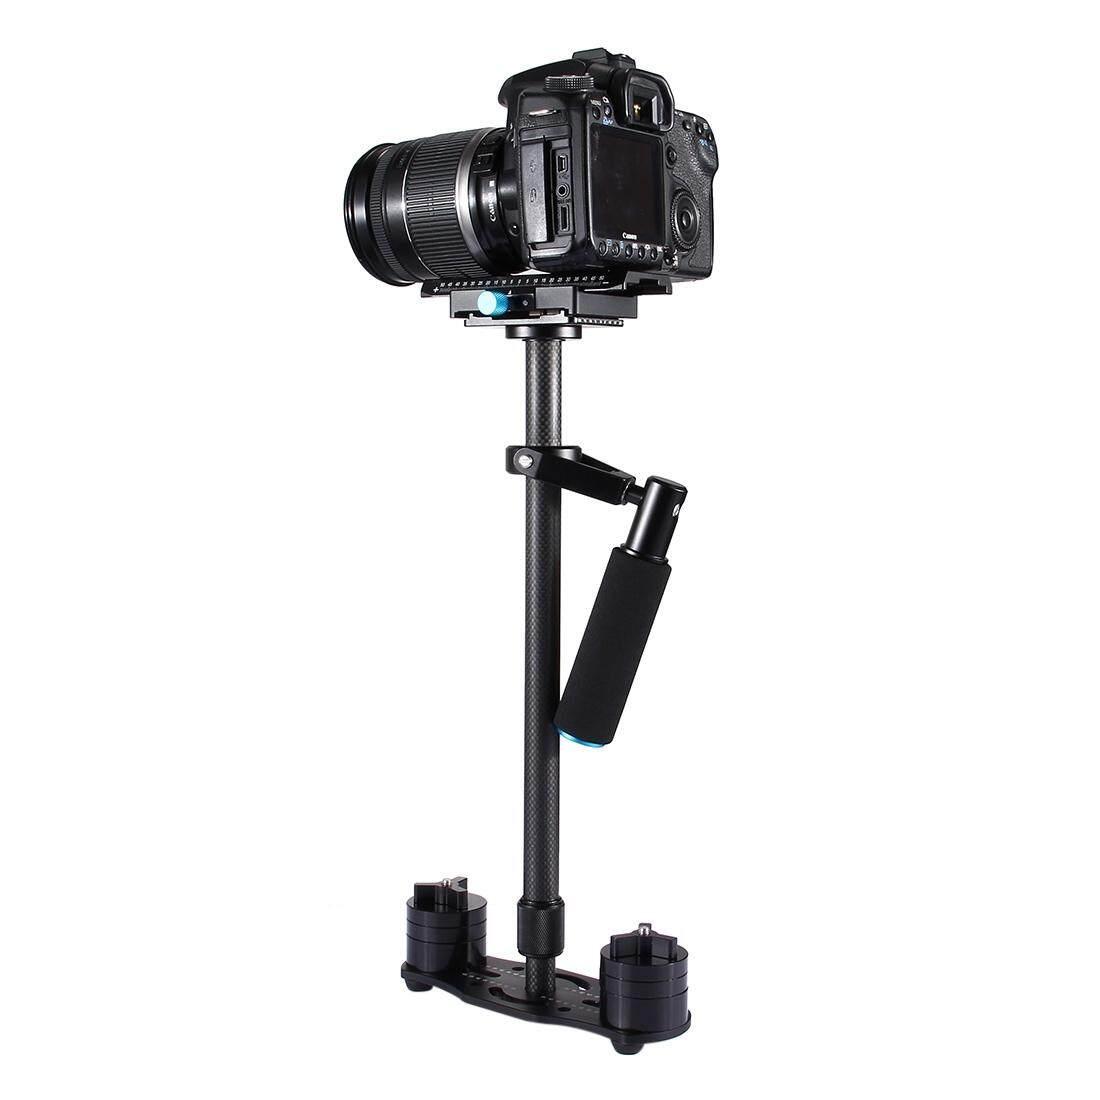 Dslr Lazada BigGo Source · Rp 3 495 000 SUTEFOTO S40 Handheld Stabilizer Steadicam Pro Version